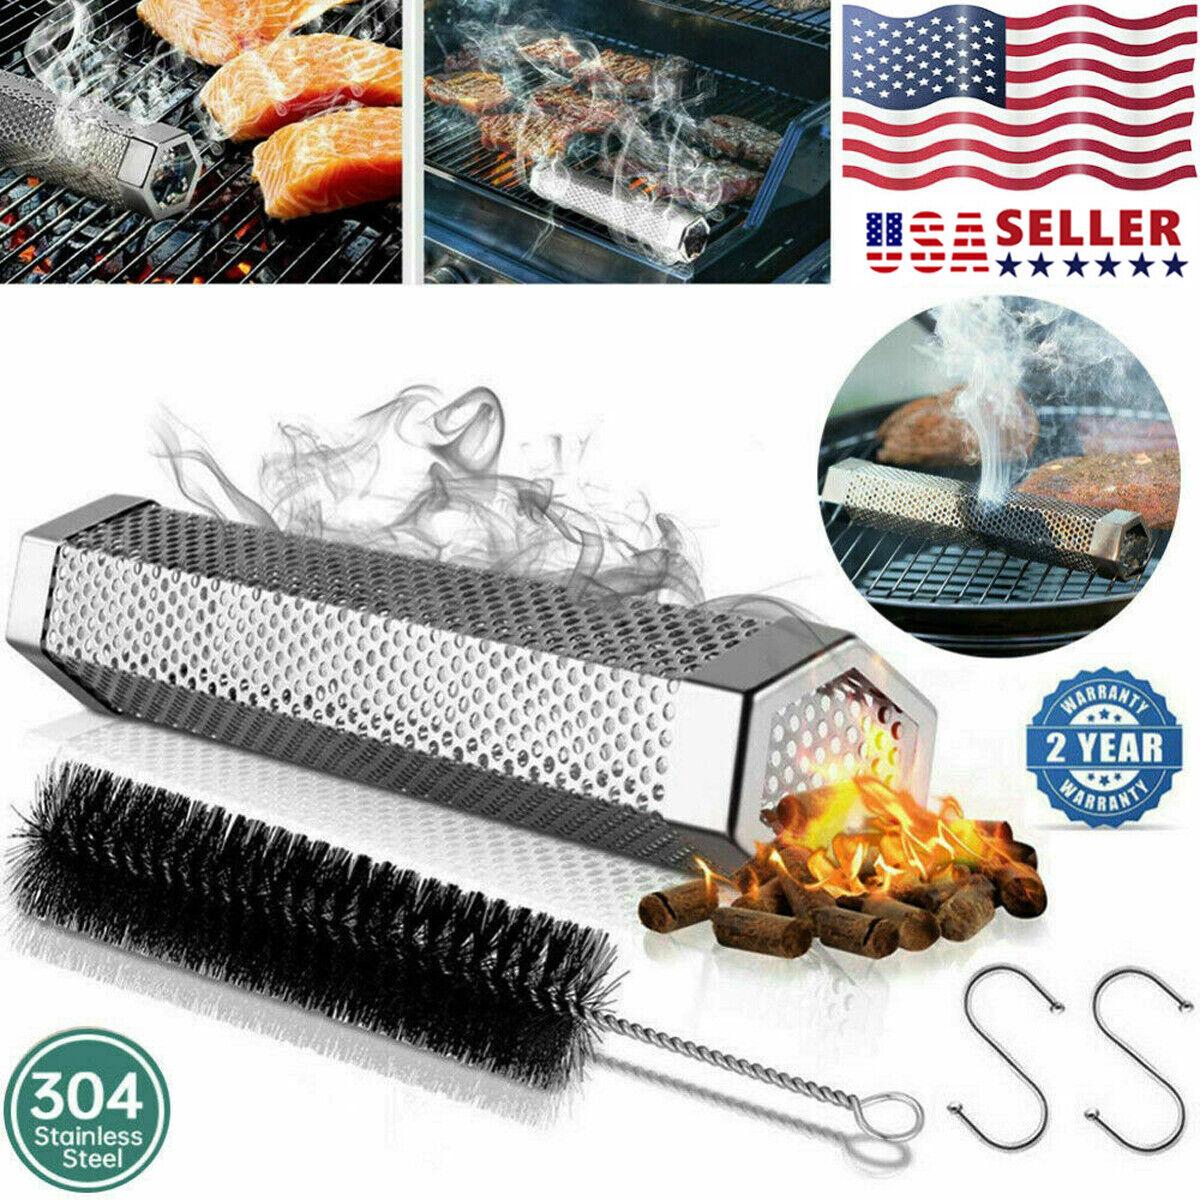 12″ Mesh Barbecue BBQ Smoker Tube Pellet Grill Smoke Pipe